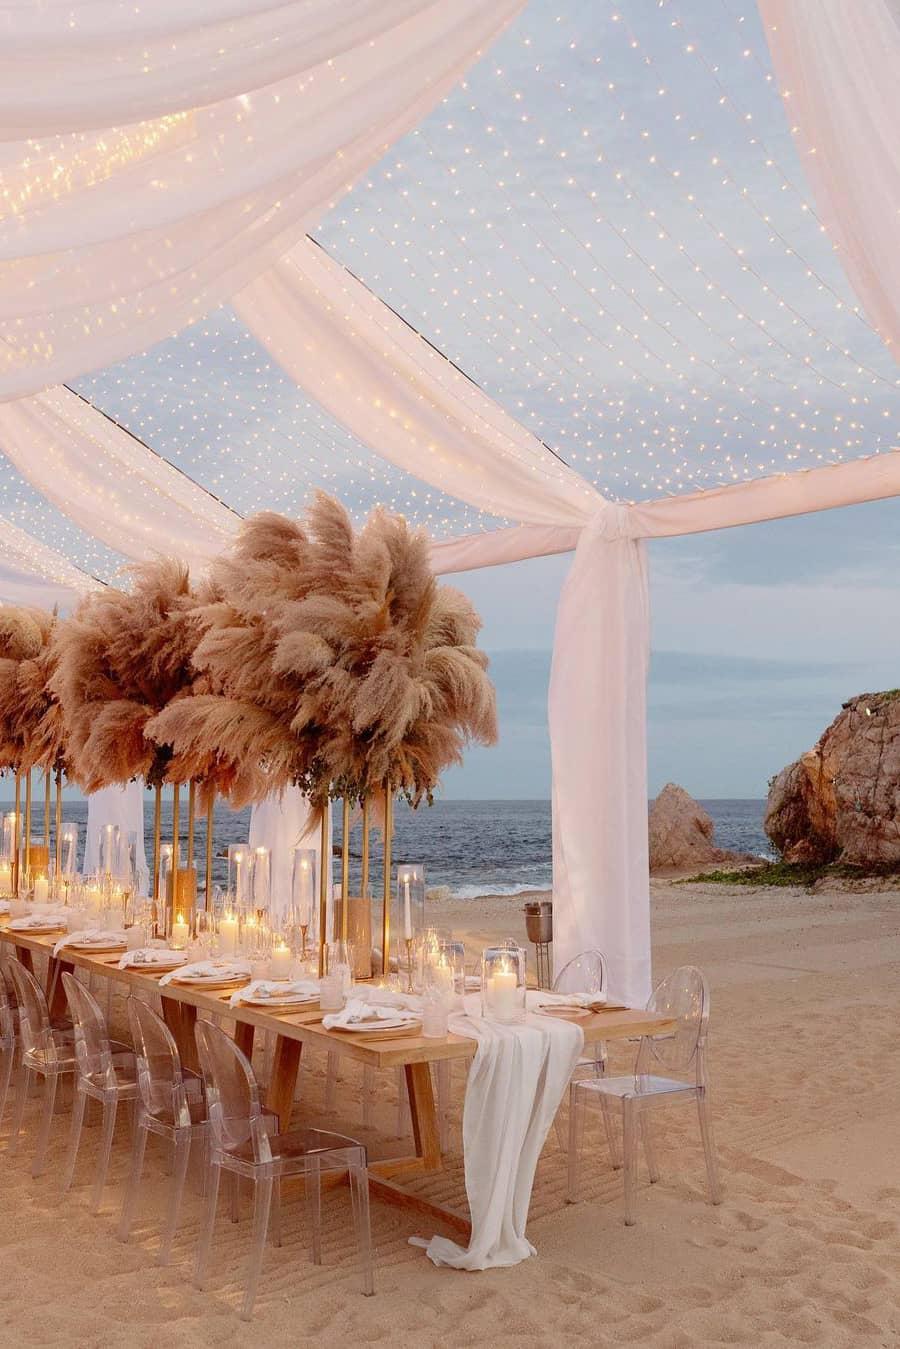 Amazing beach wedding decoration